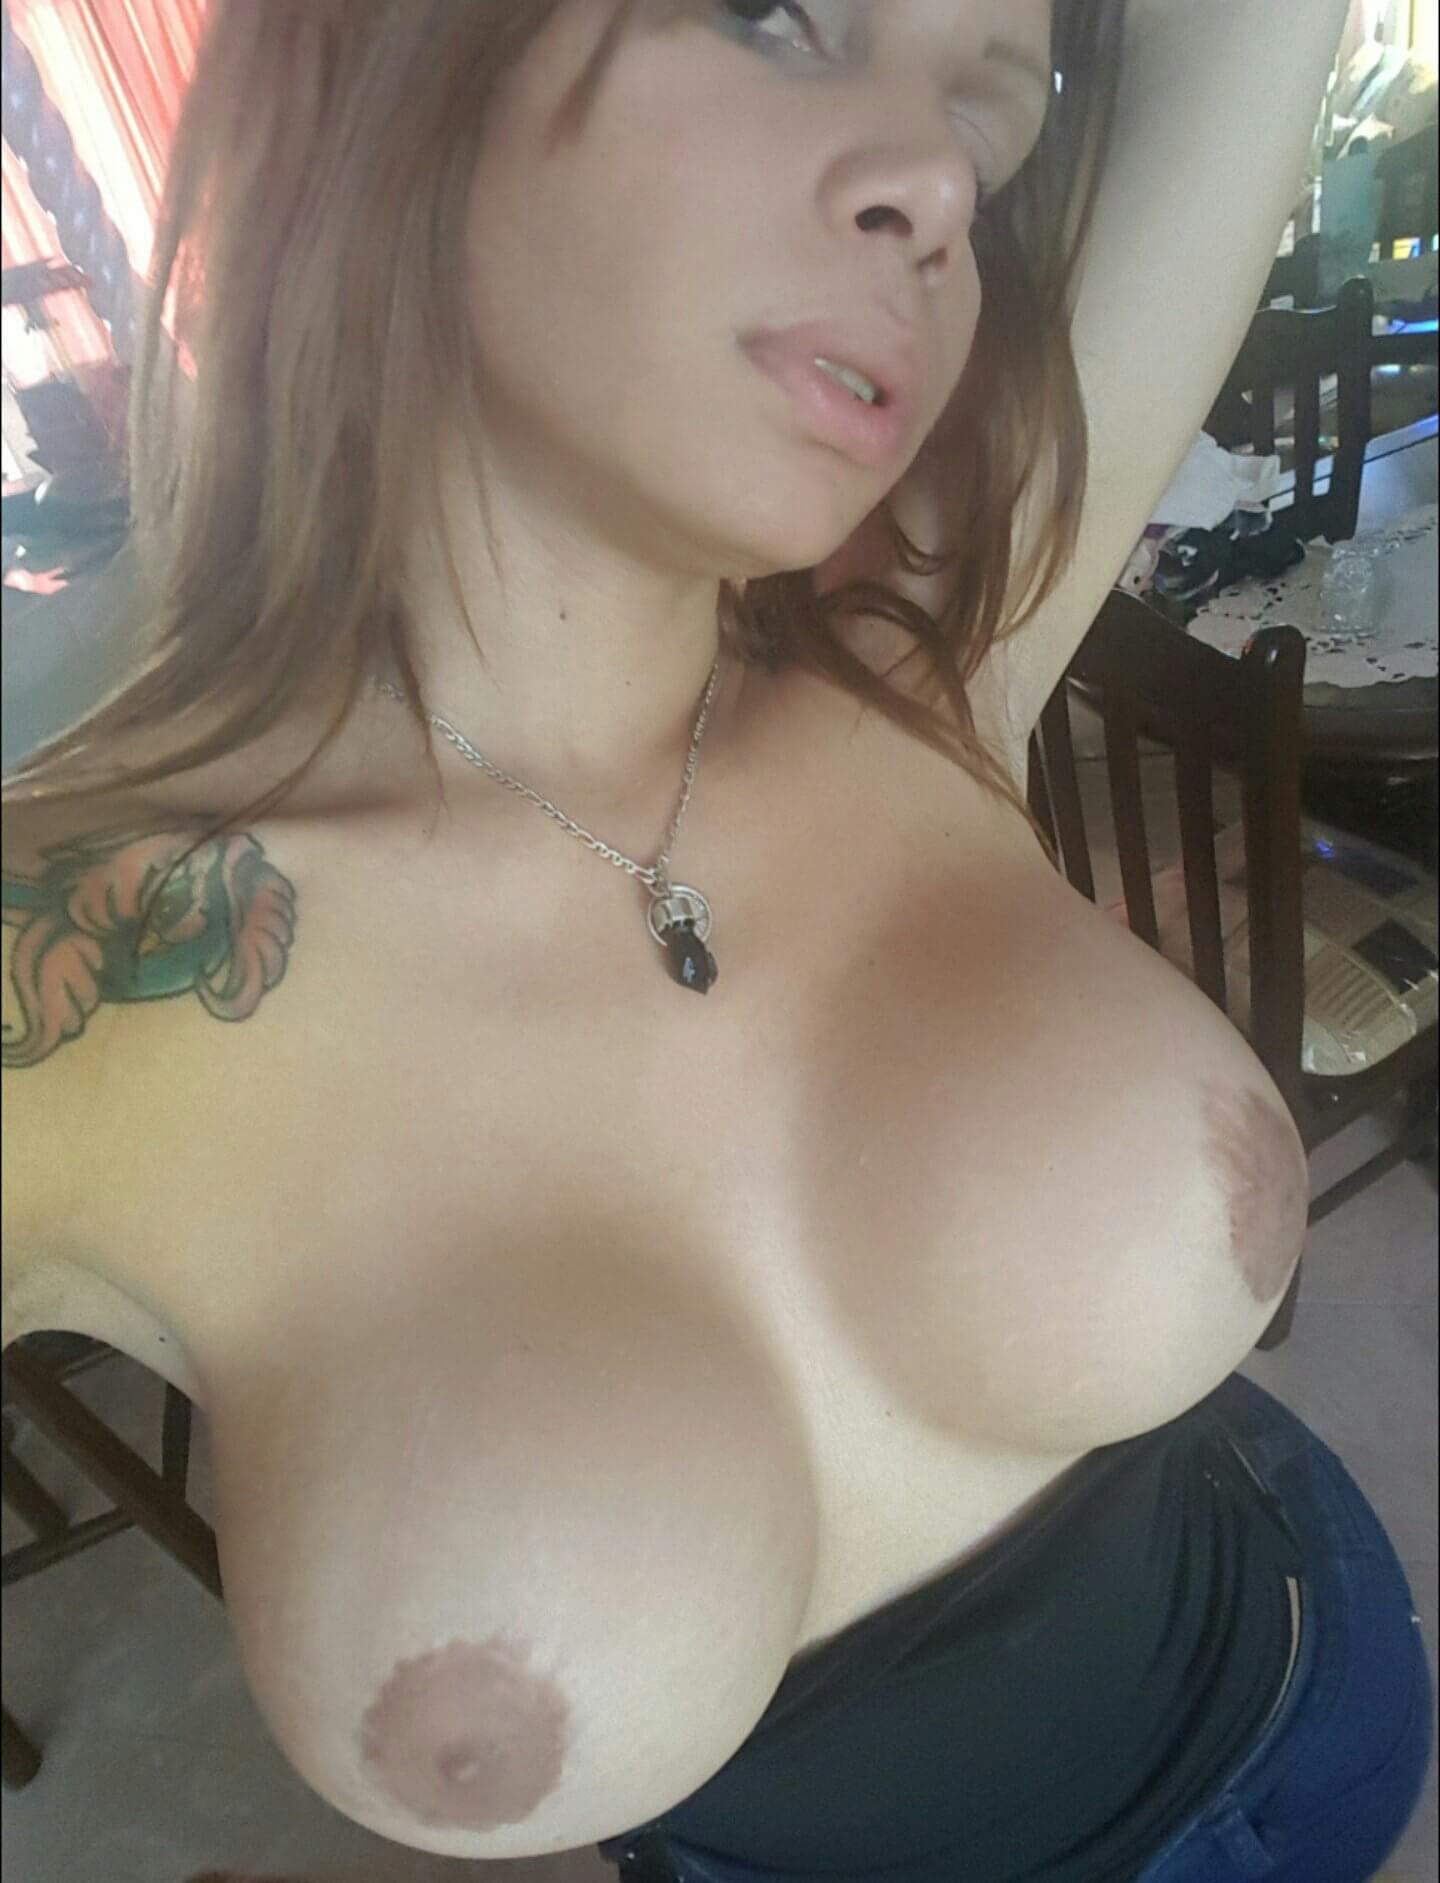 valeria gatica venezuelan tgirl with big boobs